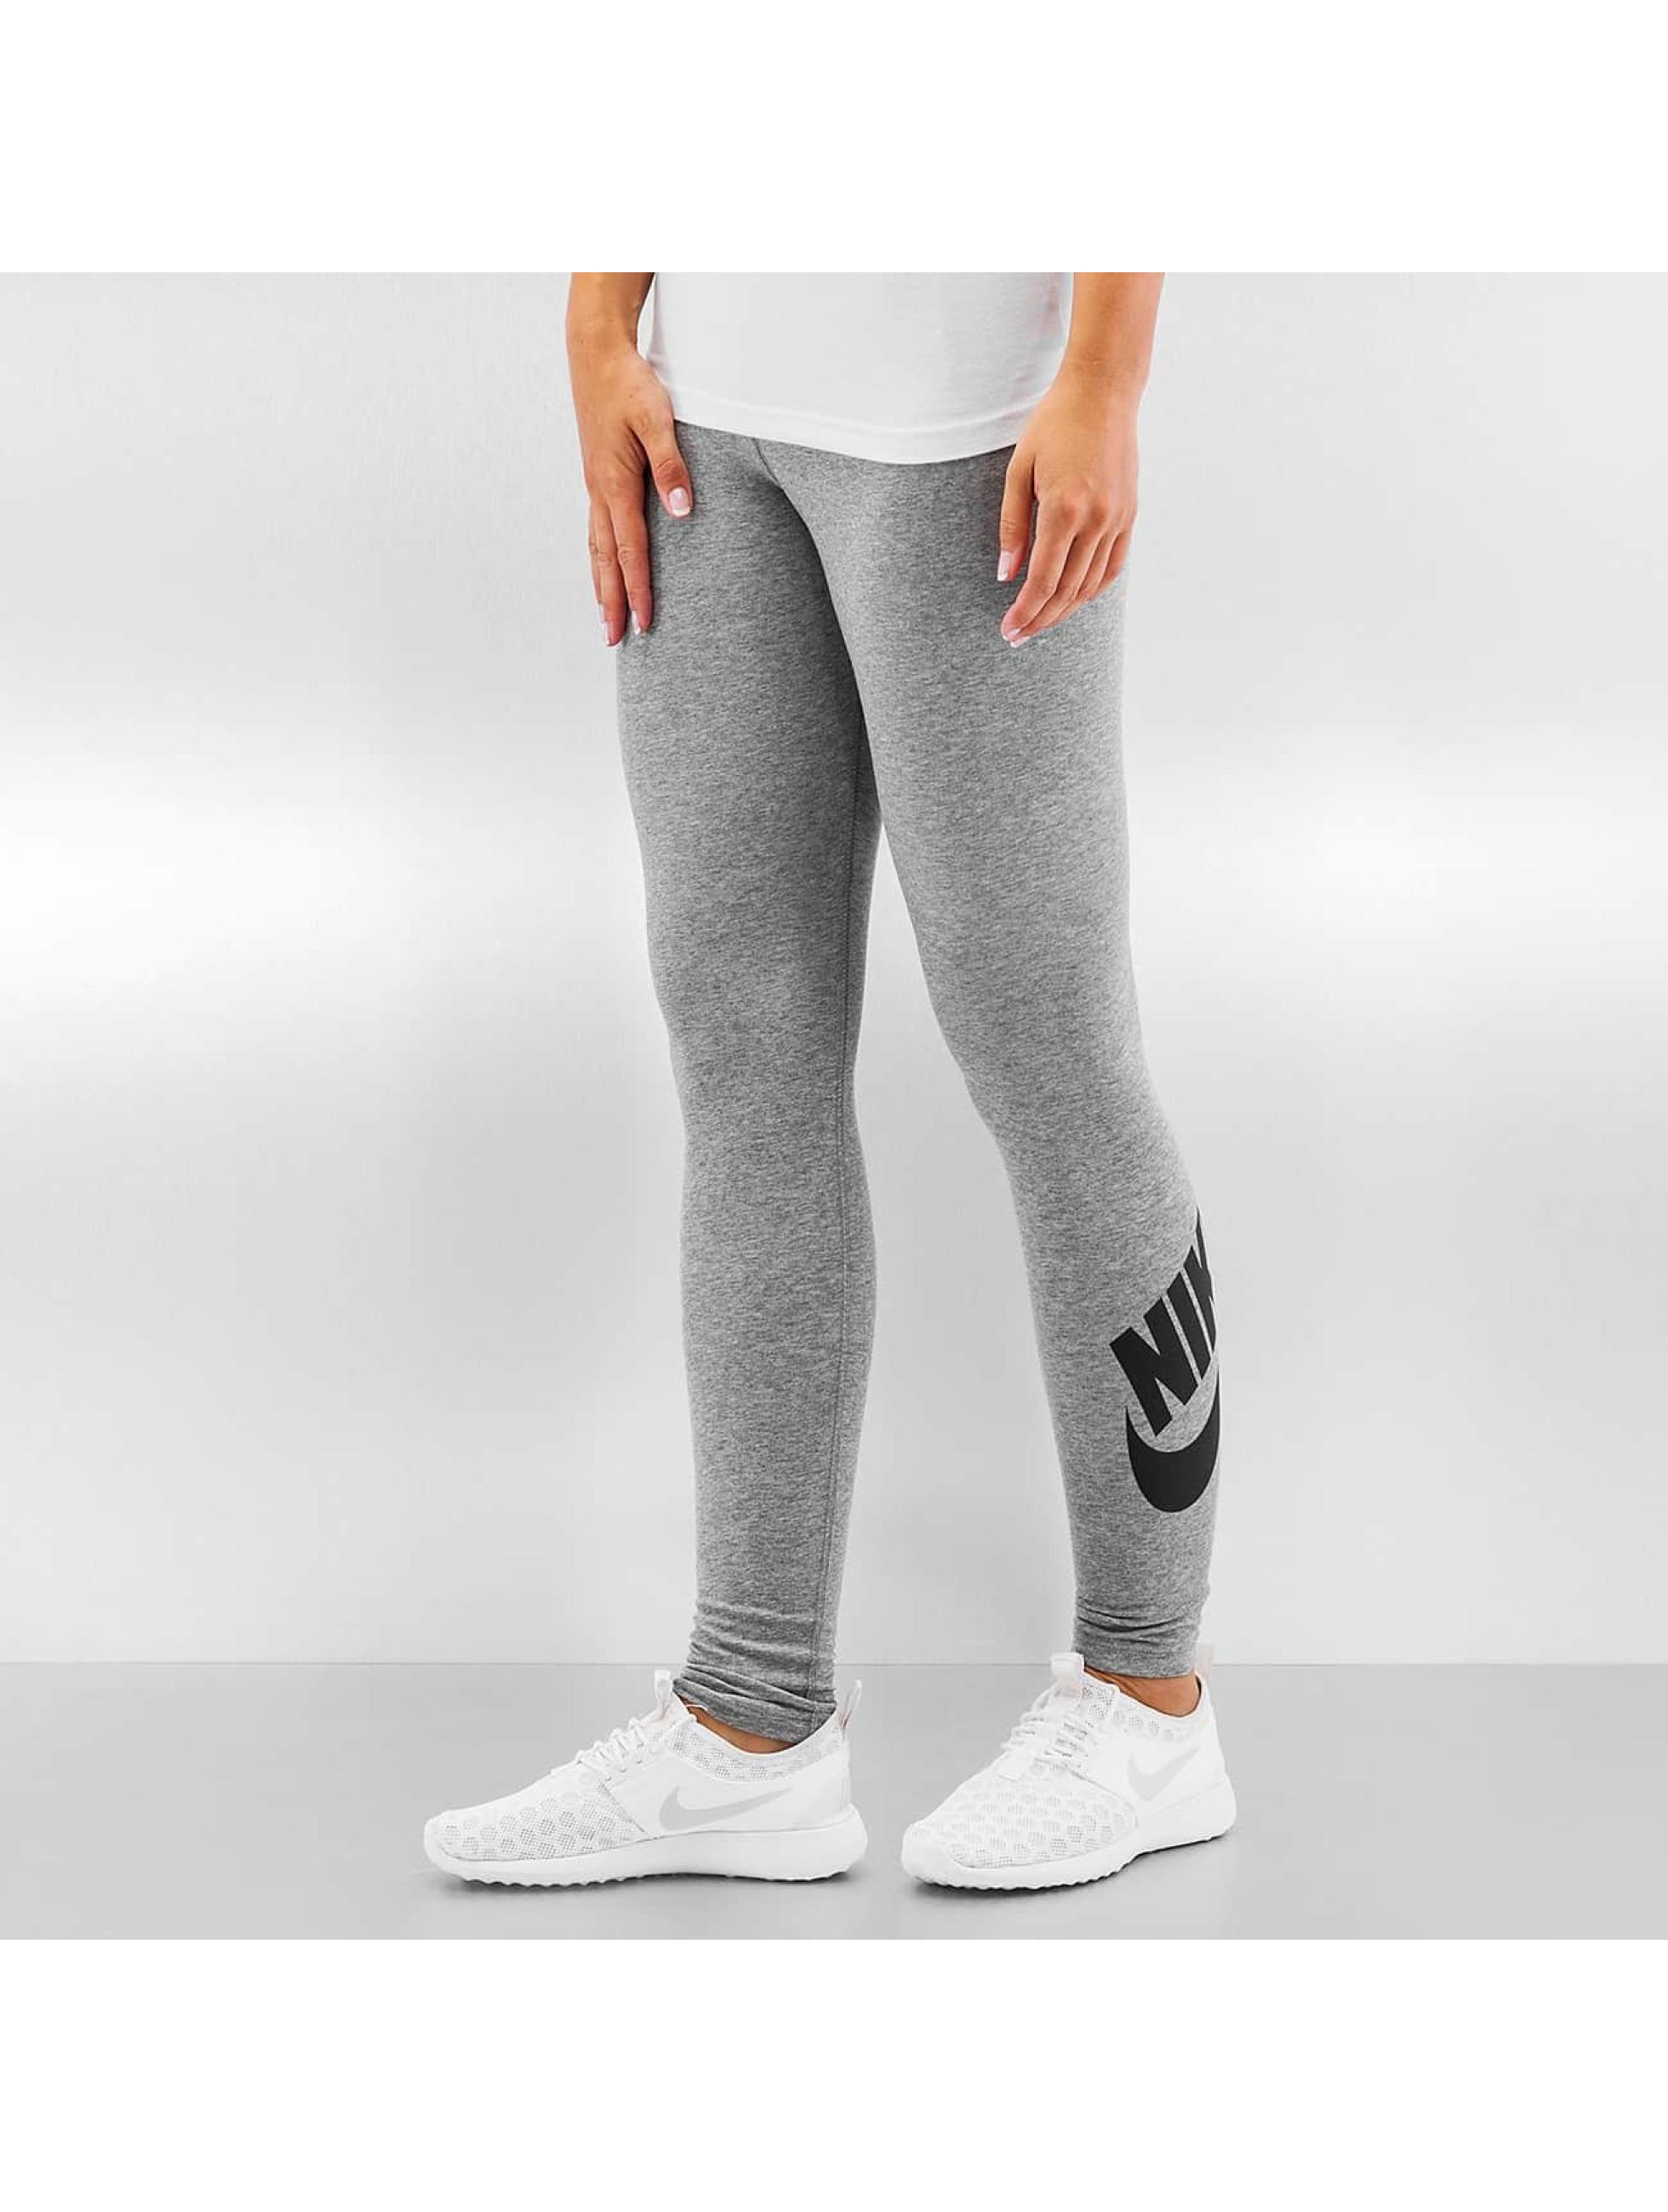 Nike Frauen Legging Leg-A-See Logo in grau